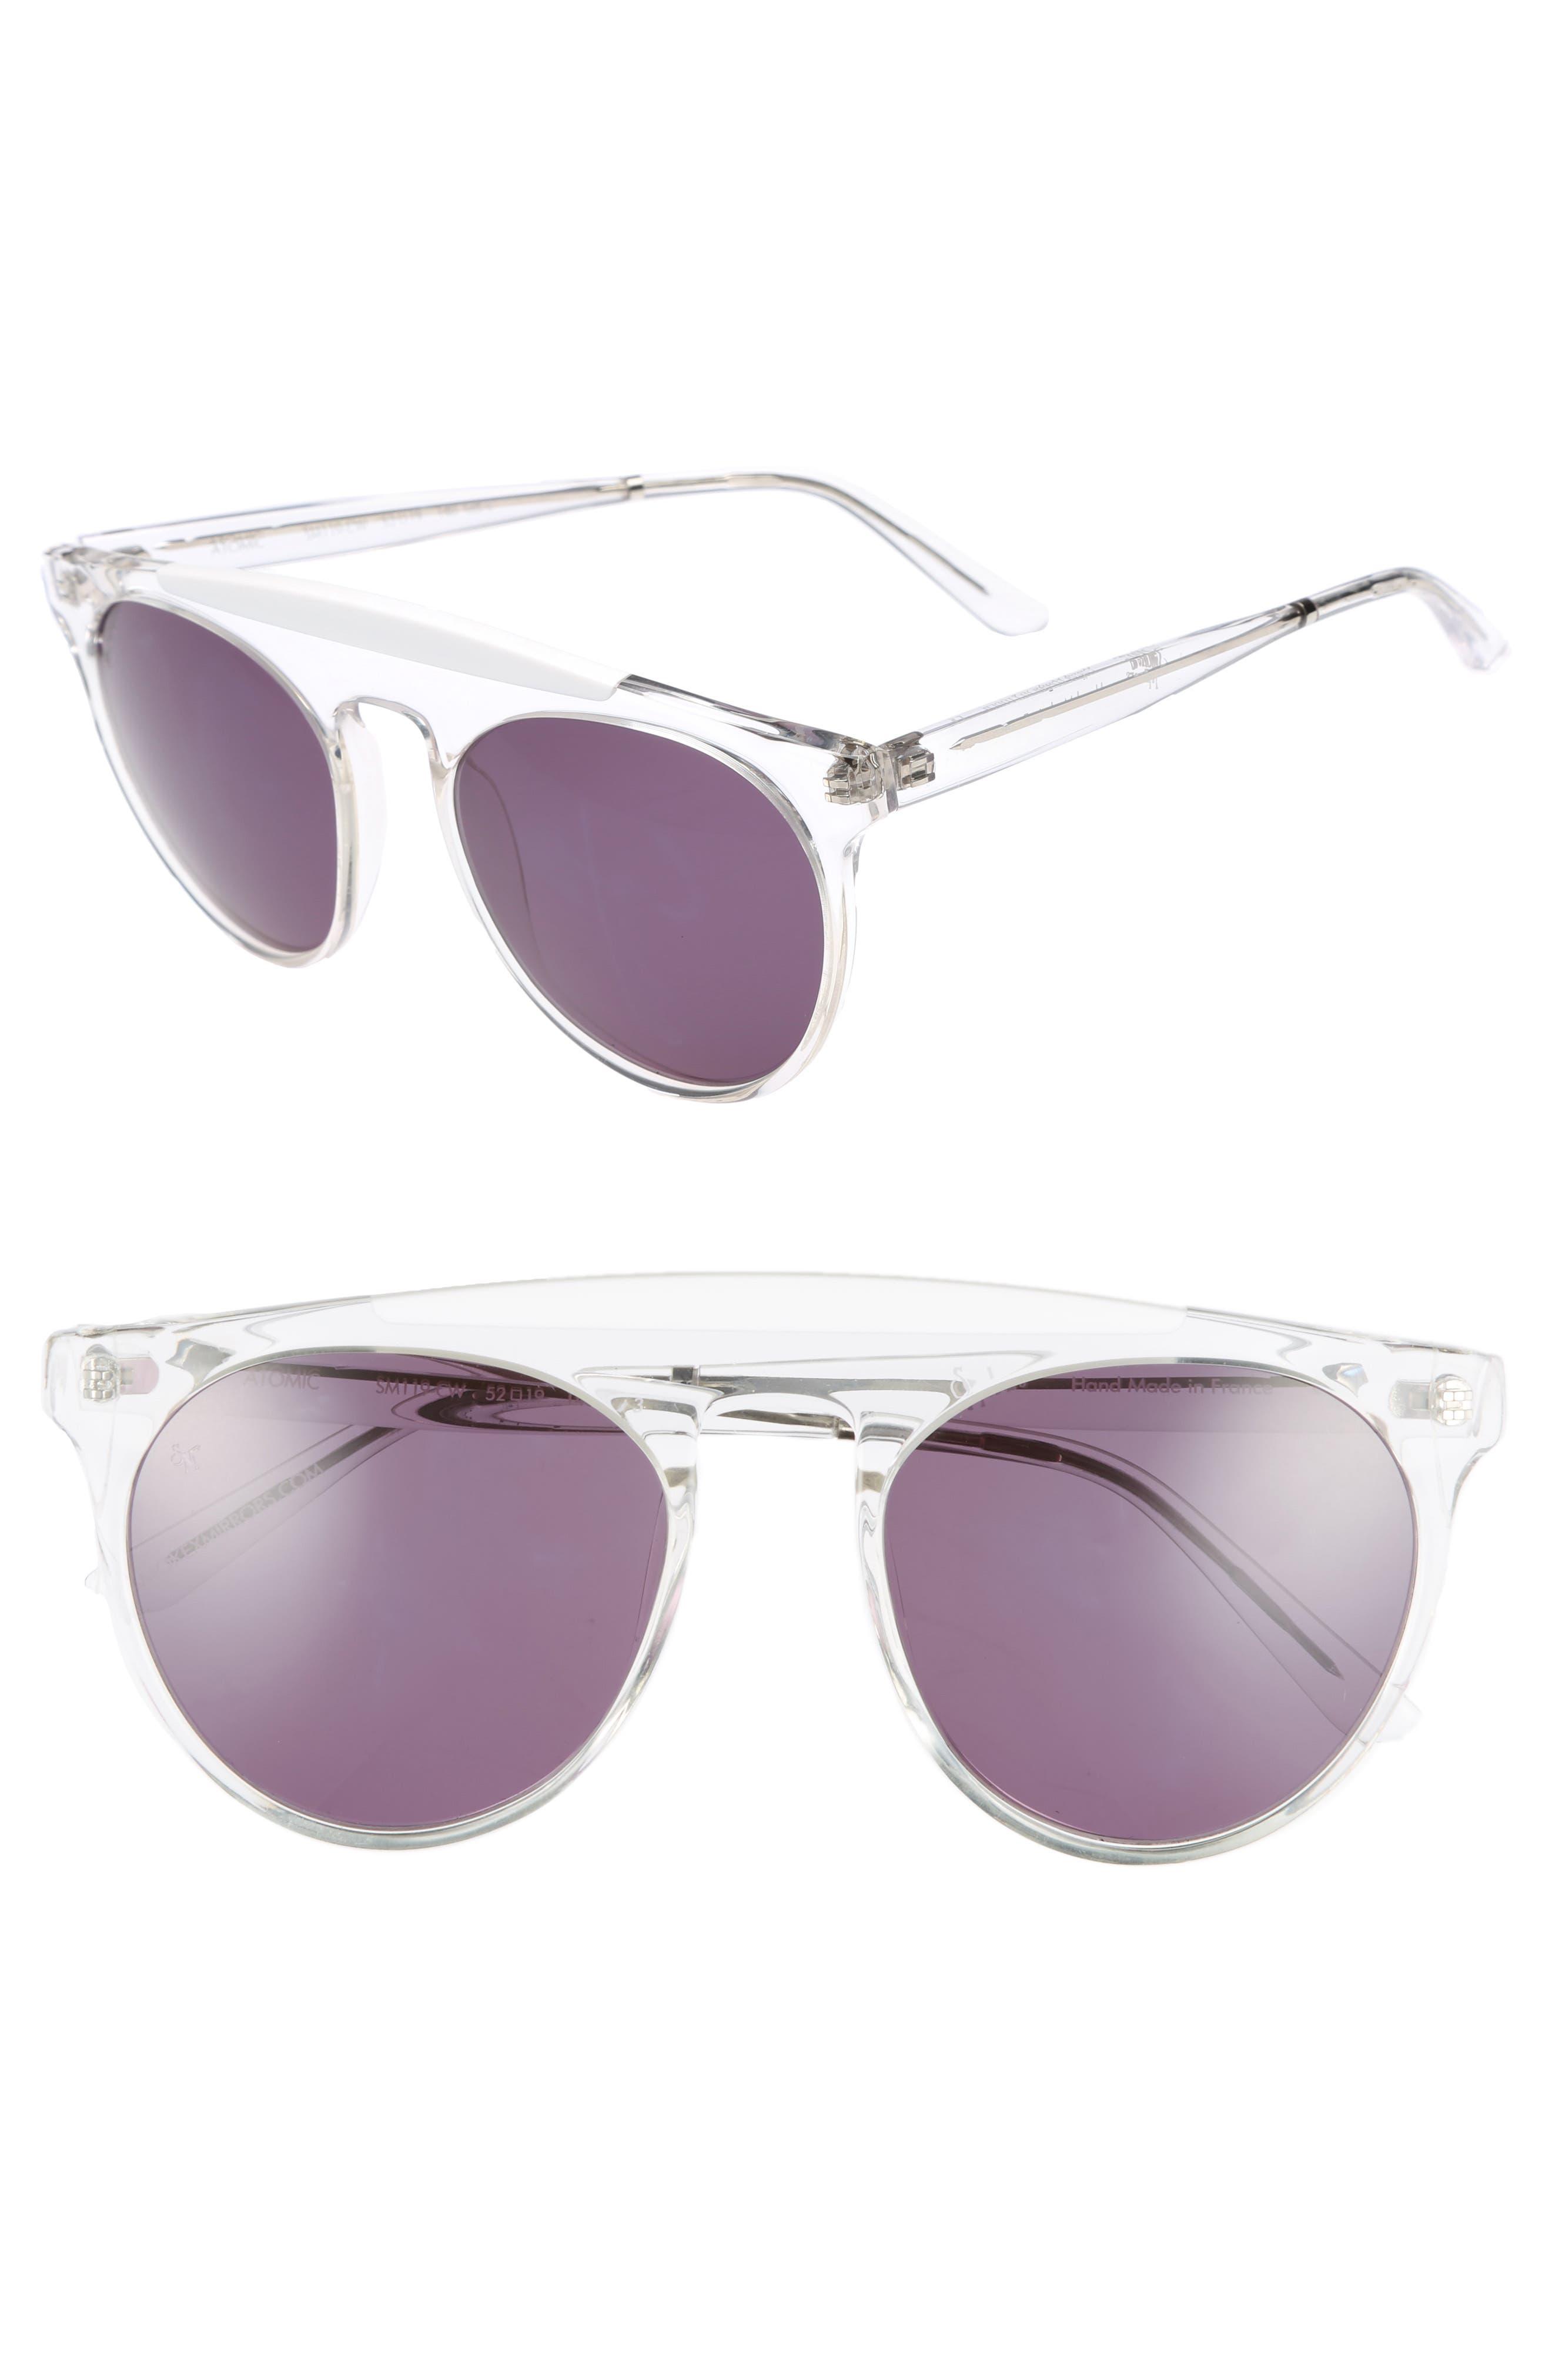 Atomic 52mm Sunglasses,                             Main thumbnail 2, color,